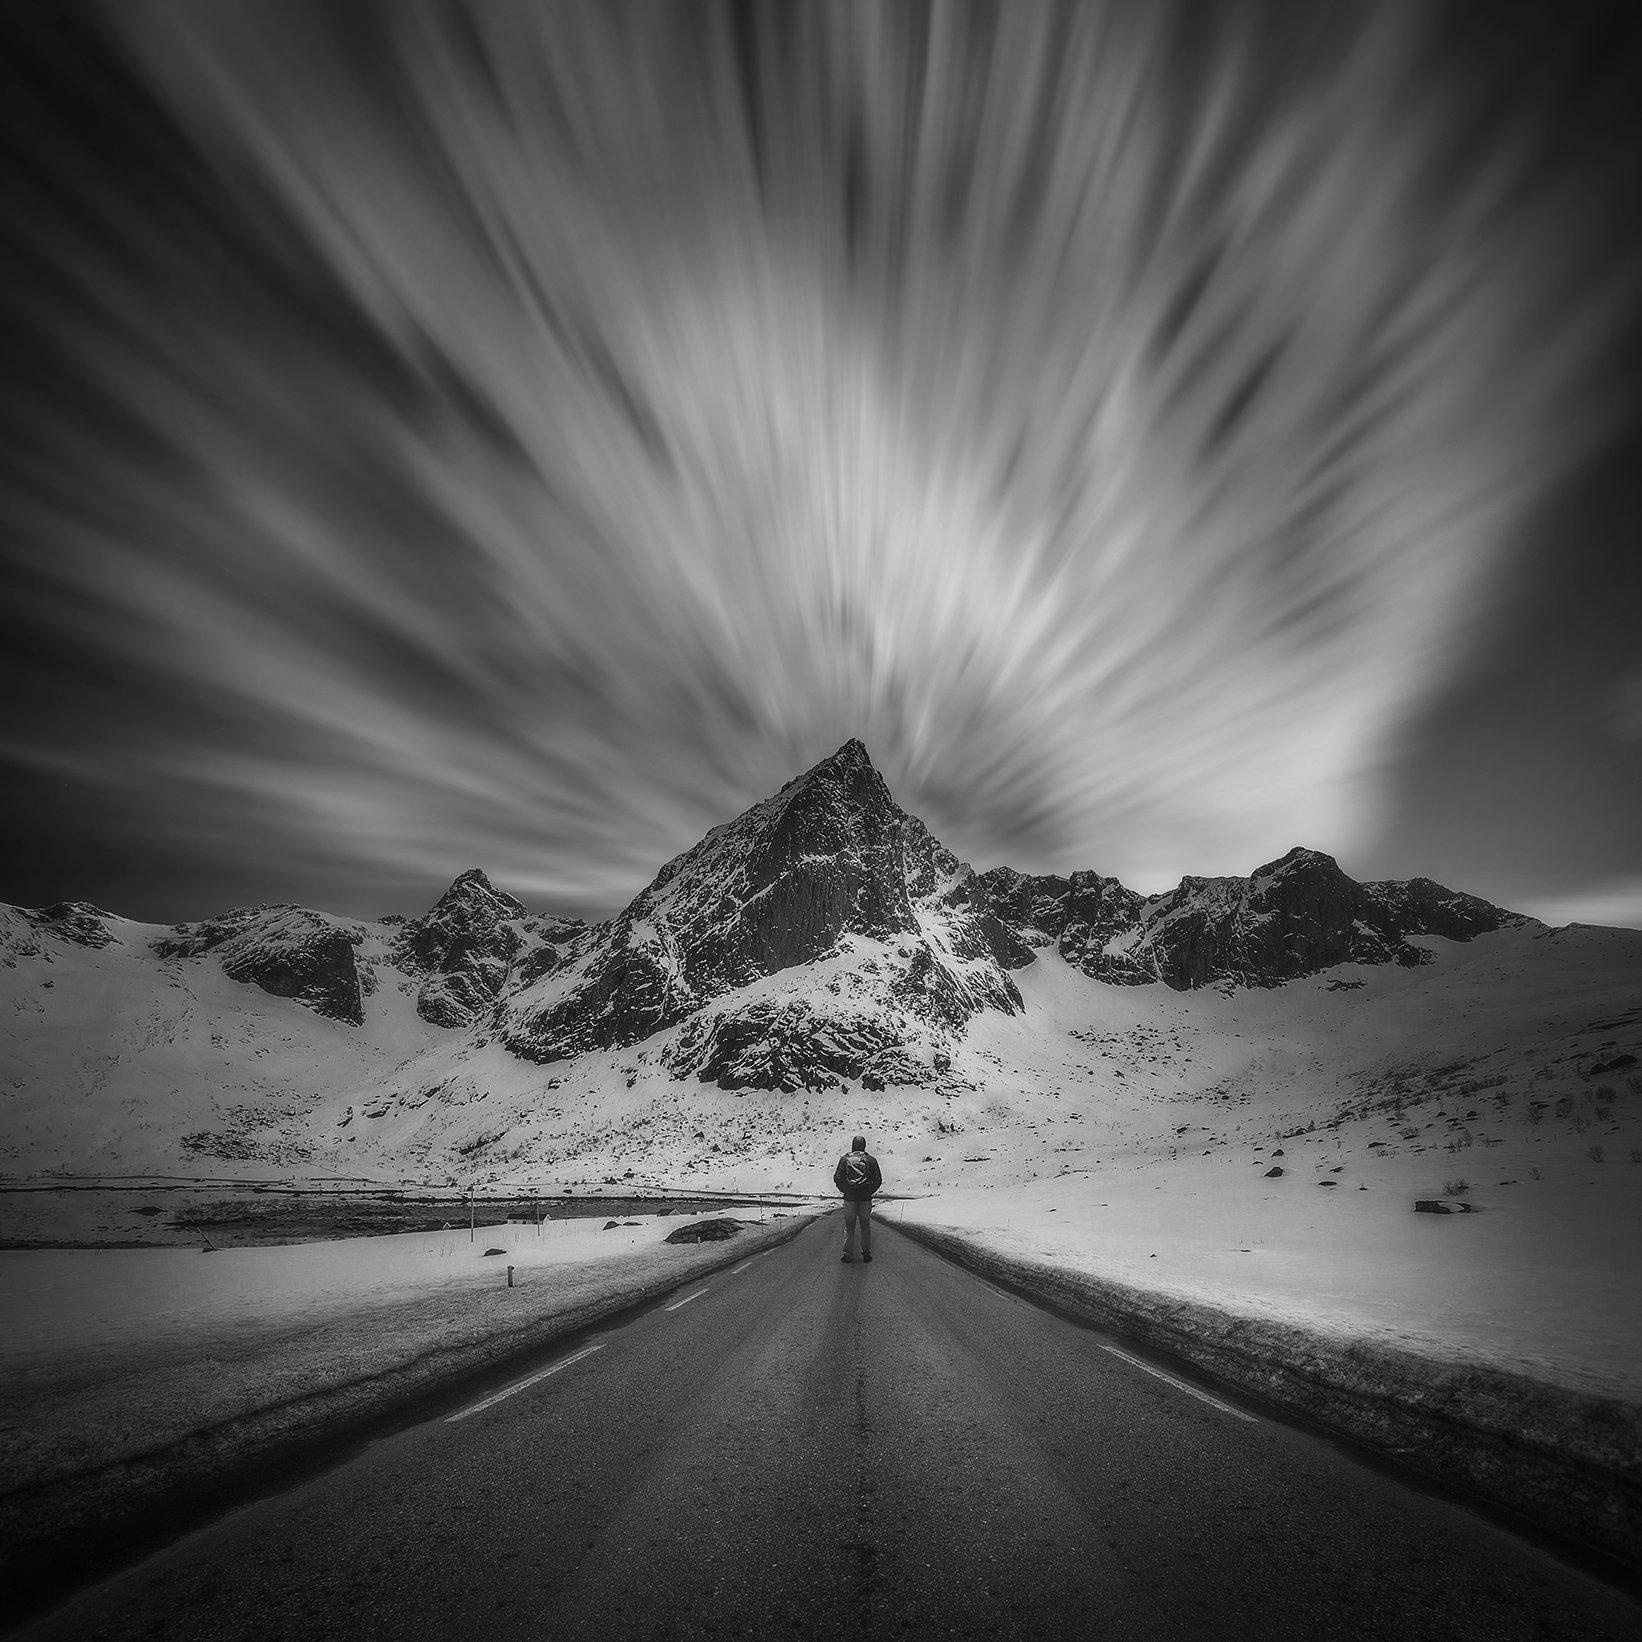 maountains, long exposure, sky, clouds, morway, lofoten, snow, way, road, man, Patrycja